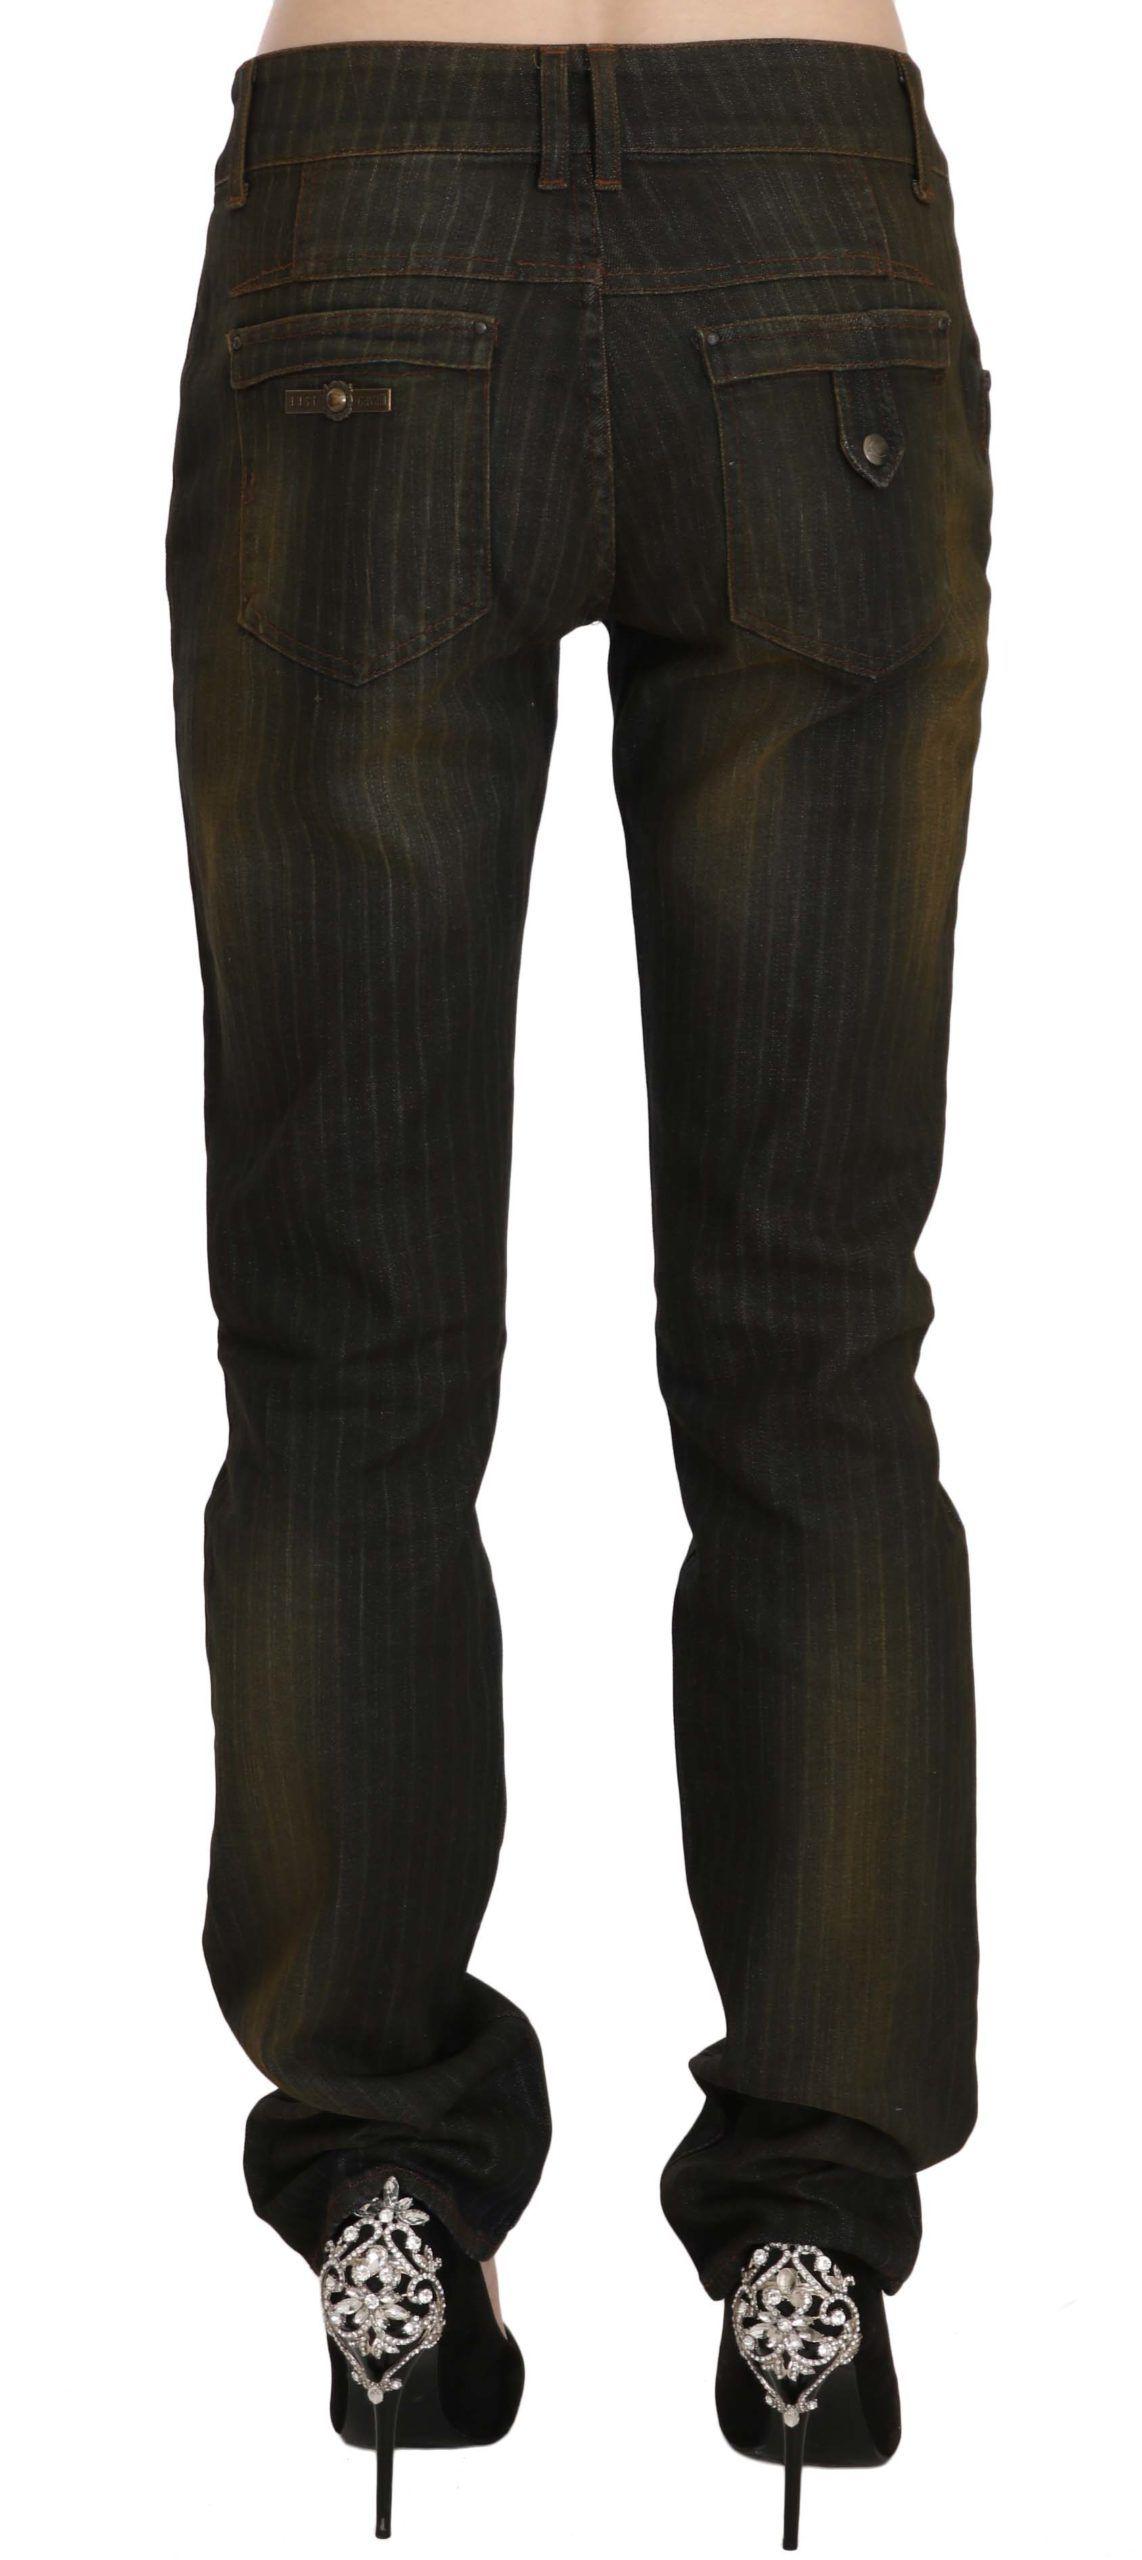 Just Cavalli Black Washed Low Waist Slim Fit Denim Pants Jeans